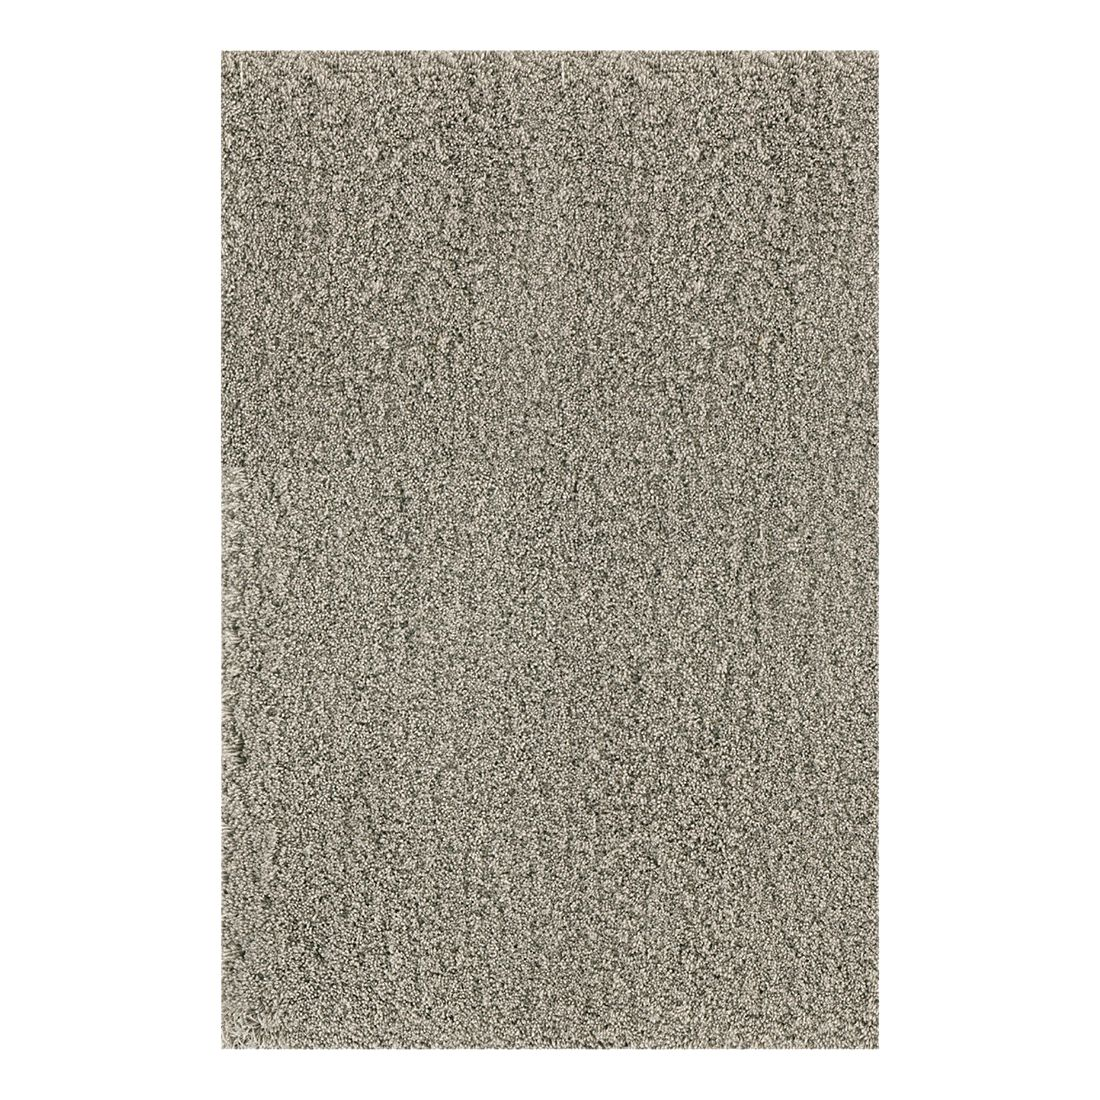 Teppich Livorno – Grau – 90 x 160 cm, Astra kaufen